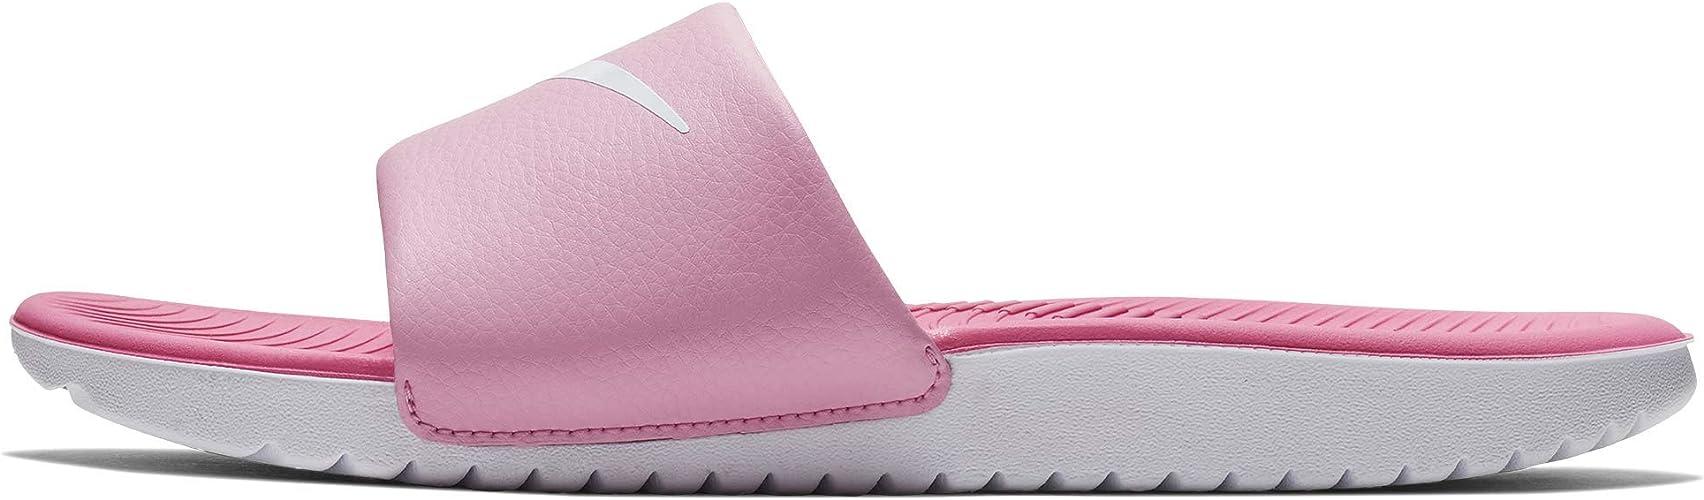 GS//PS Zapatos de Playa y Piscina para Ni/ños Nike Kawa Slide